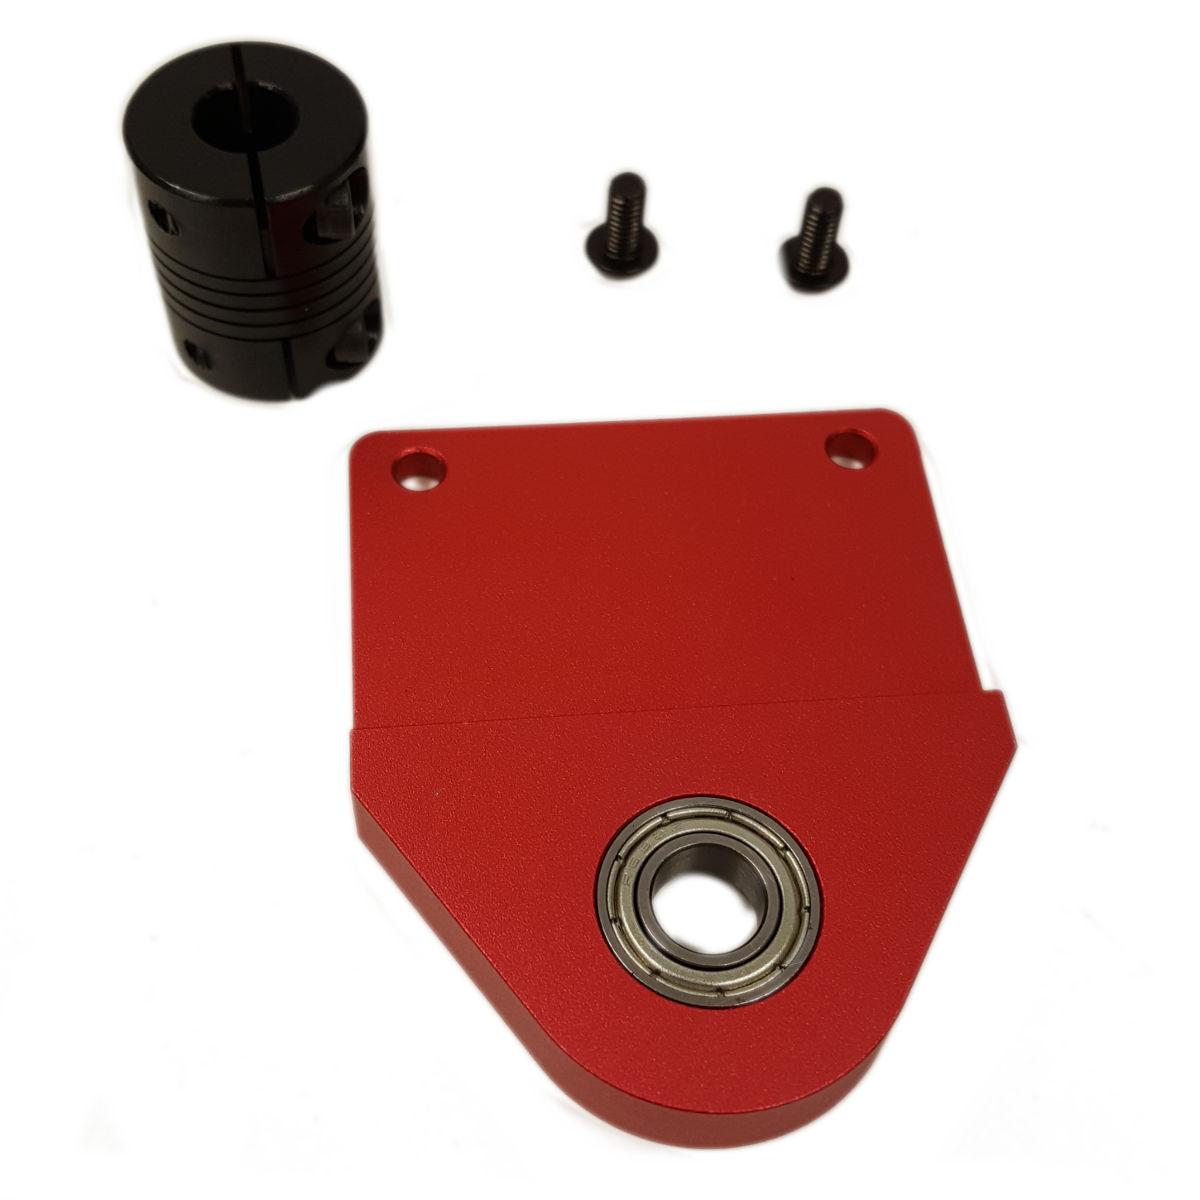 Anti-wobble kit for Wanhao Duplicator 7 - 3D Printing Canada